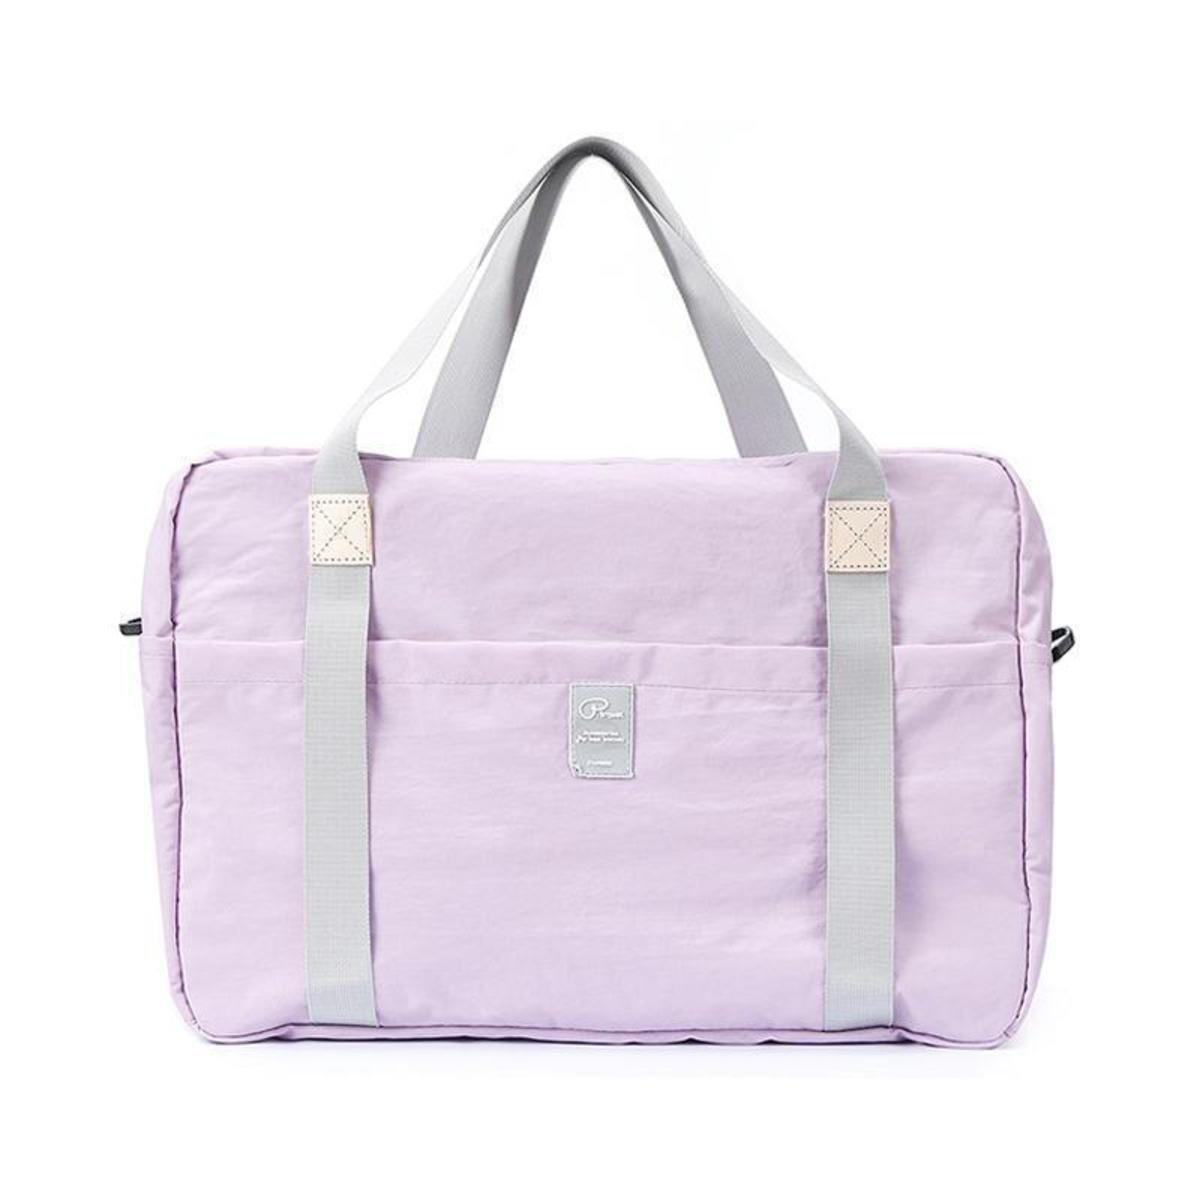 P. Travel nylon waterproof folding travel storage bag - Light purple